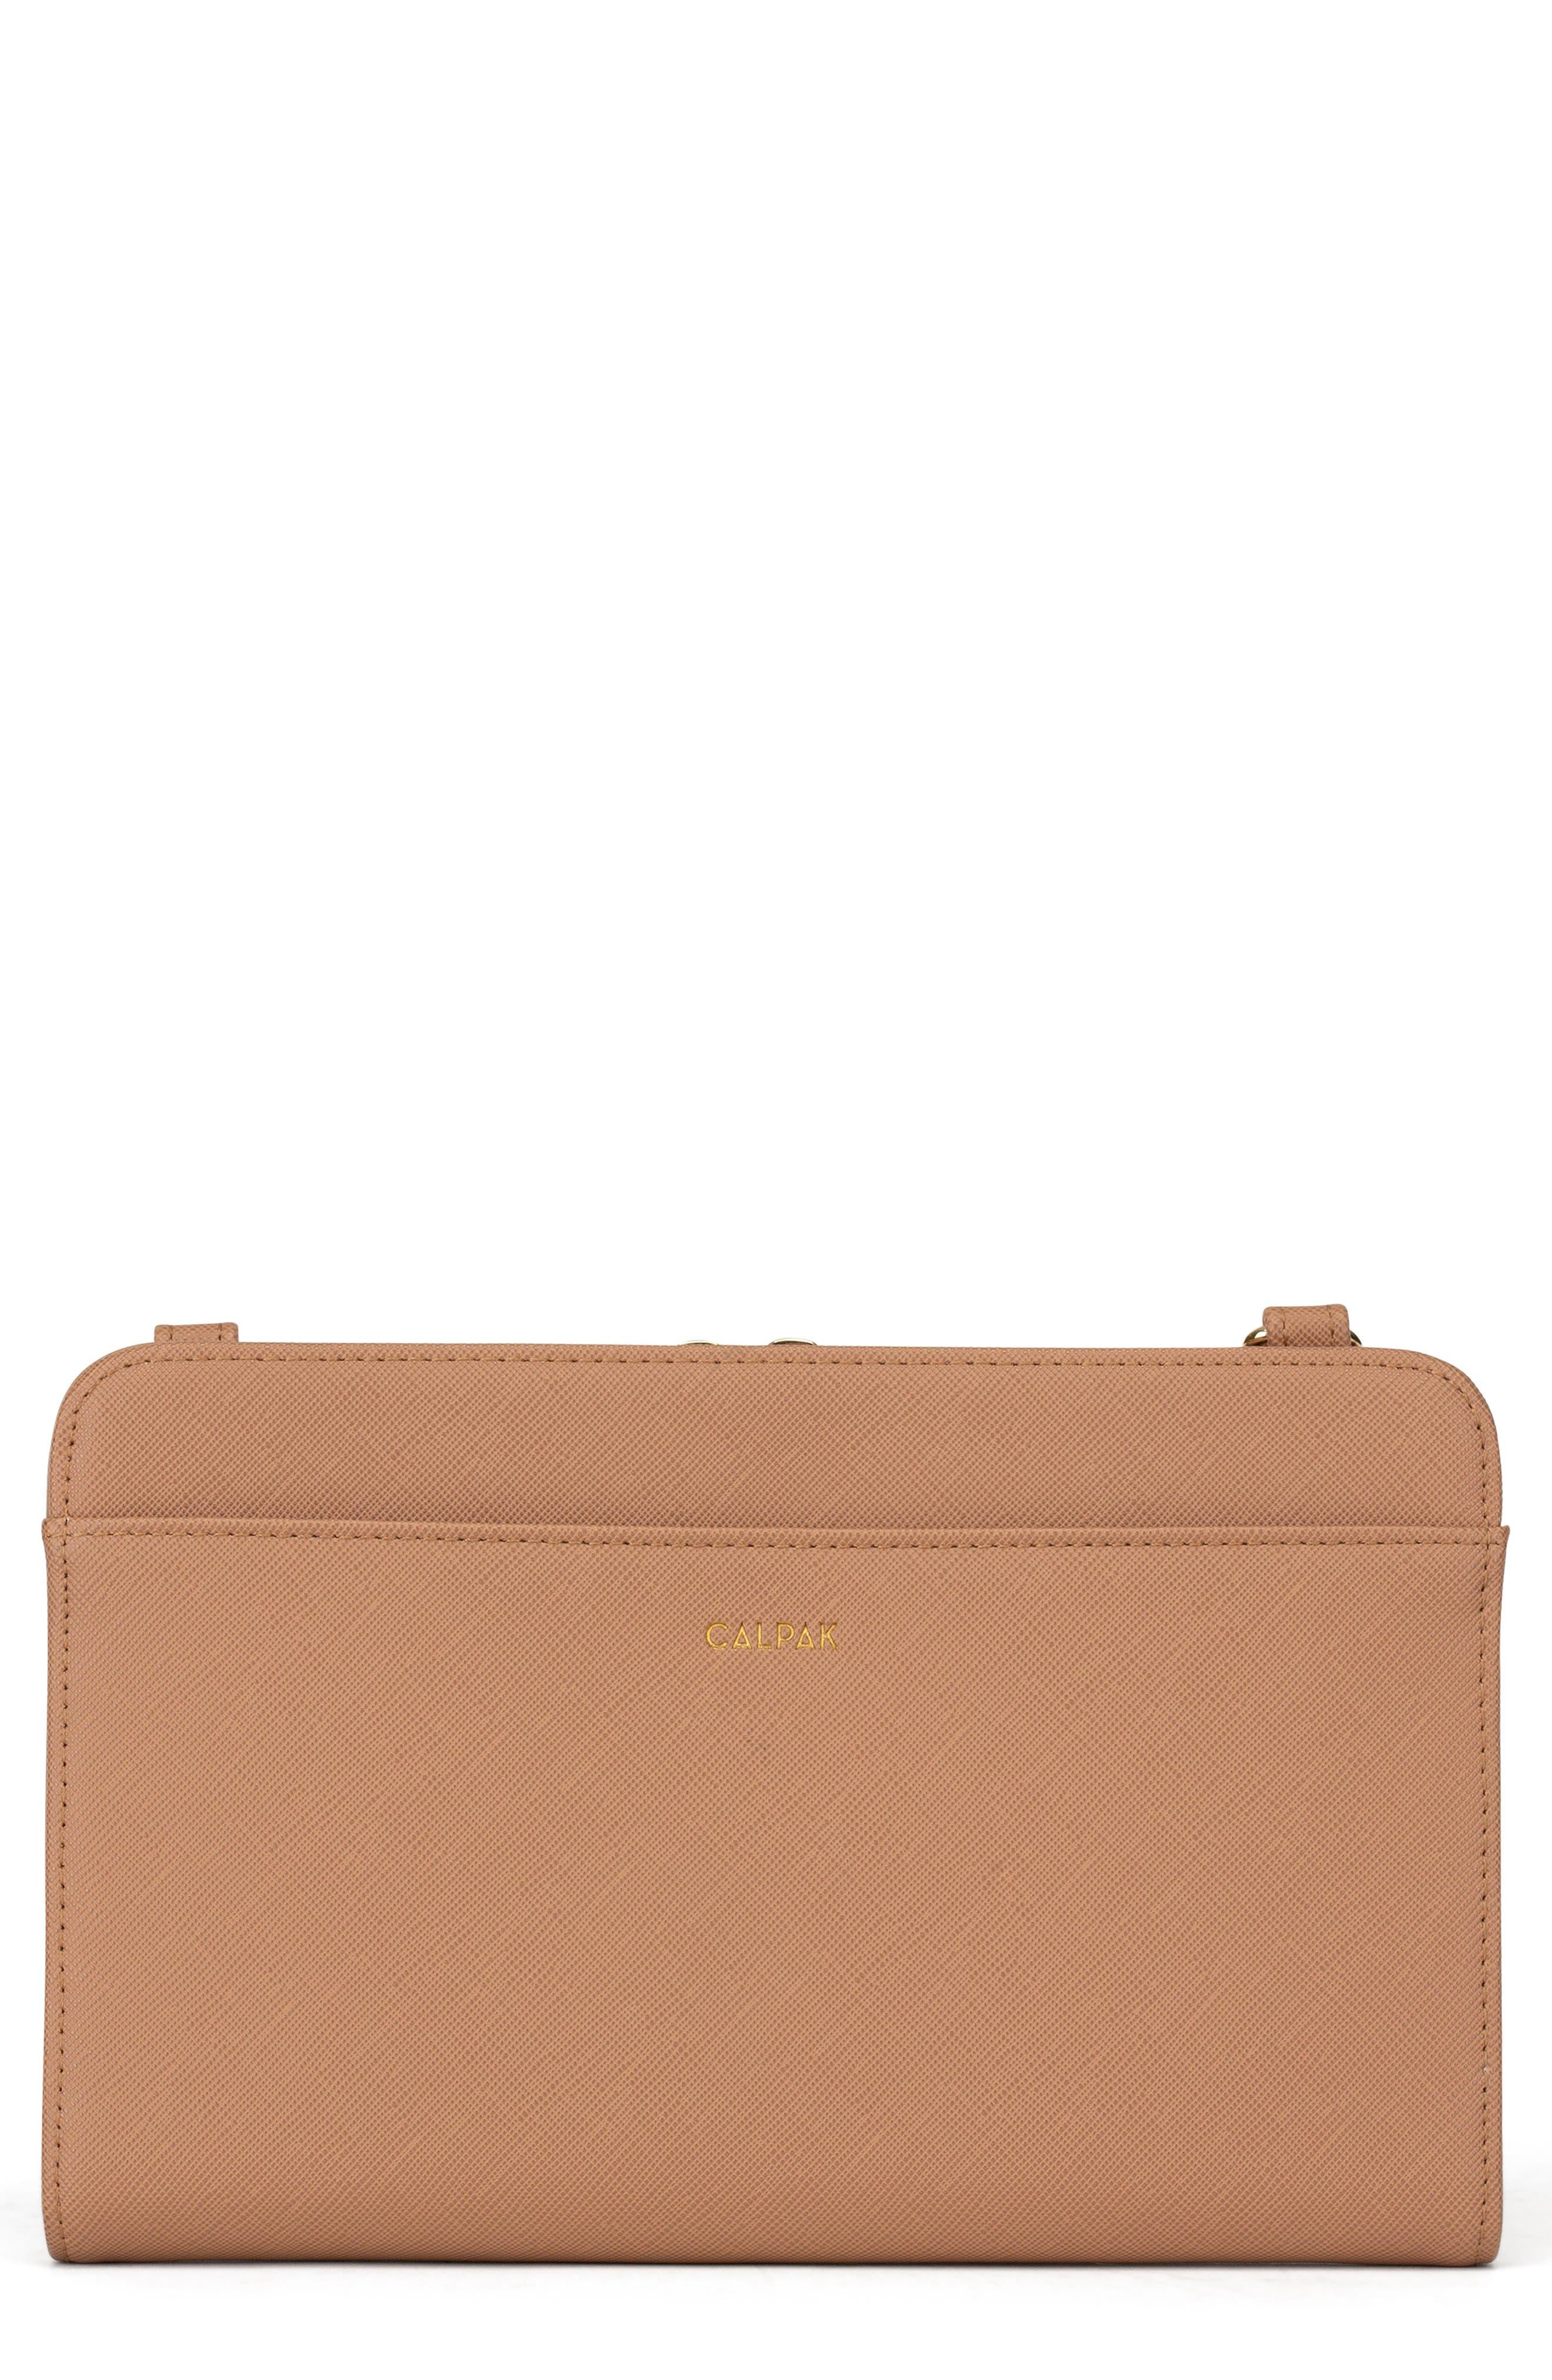 CALPAK, Faux Leather RFID Travel Wallet, Main thumbnail 1, color, CARAMEL